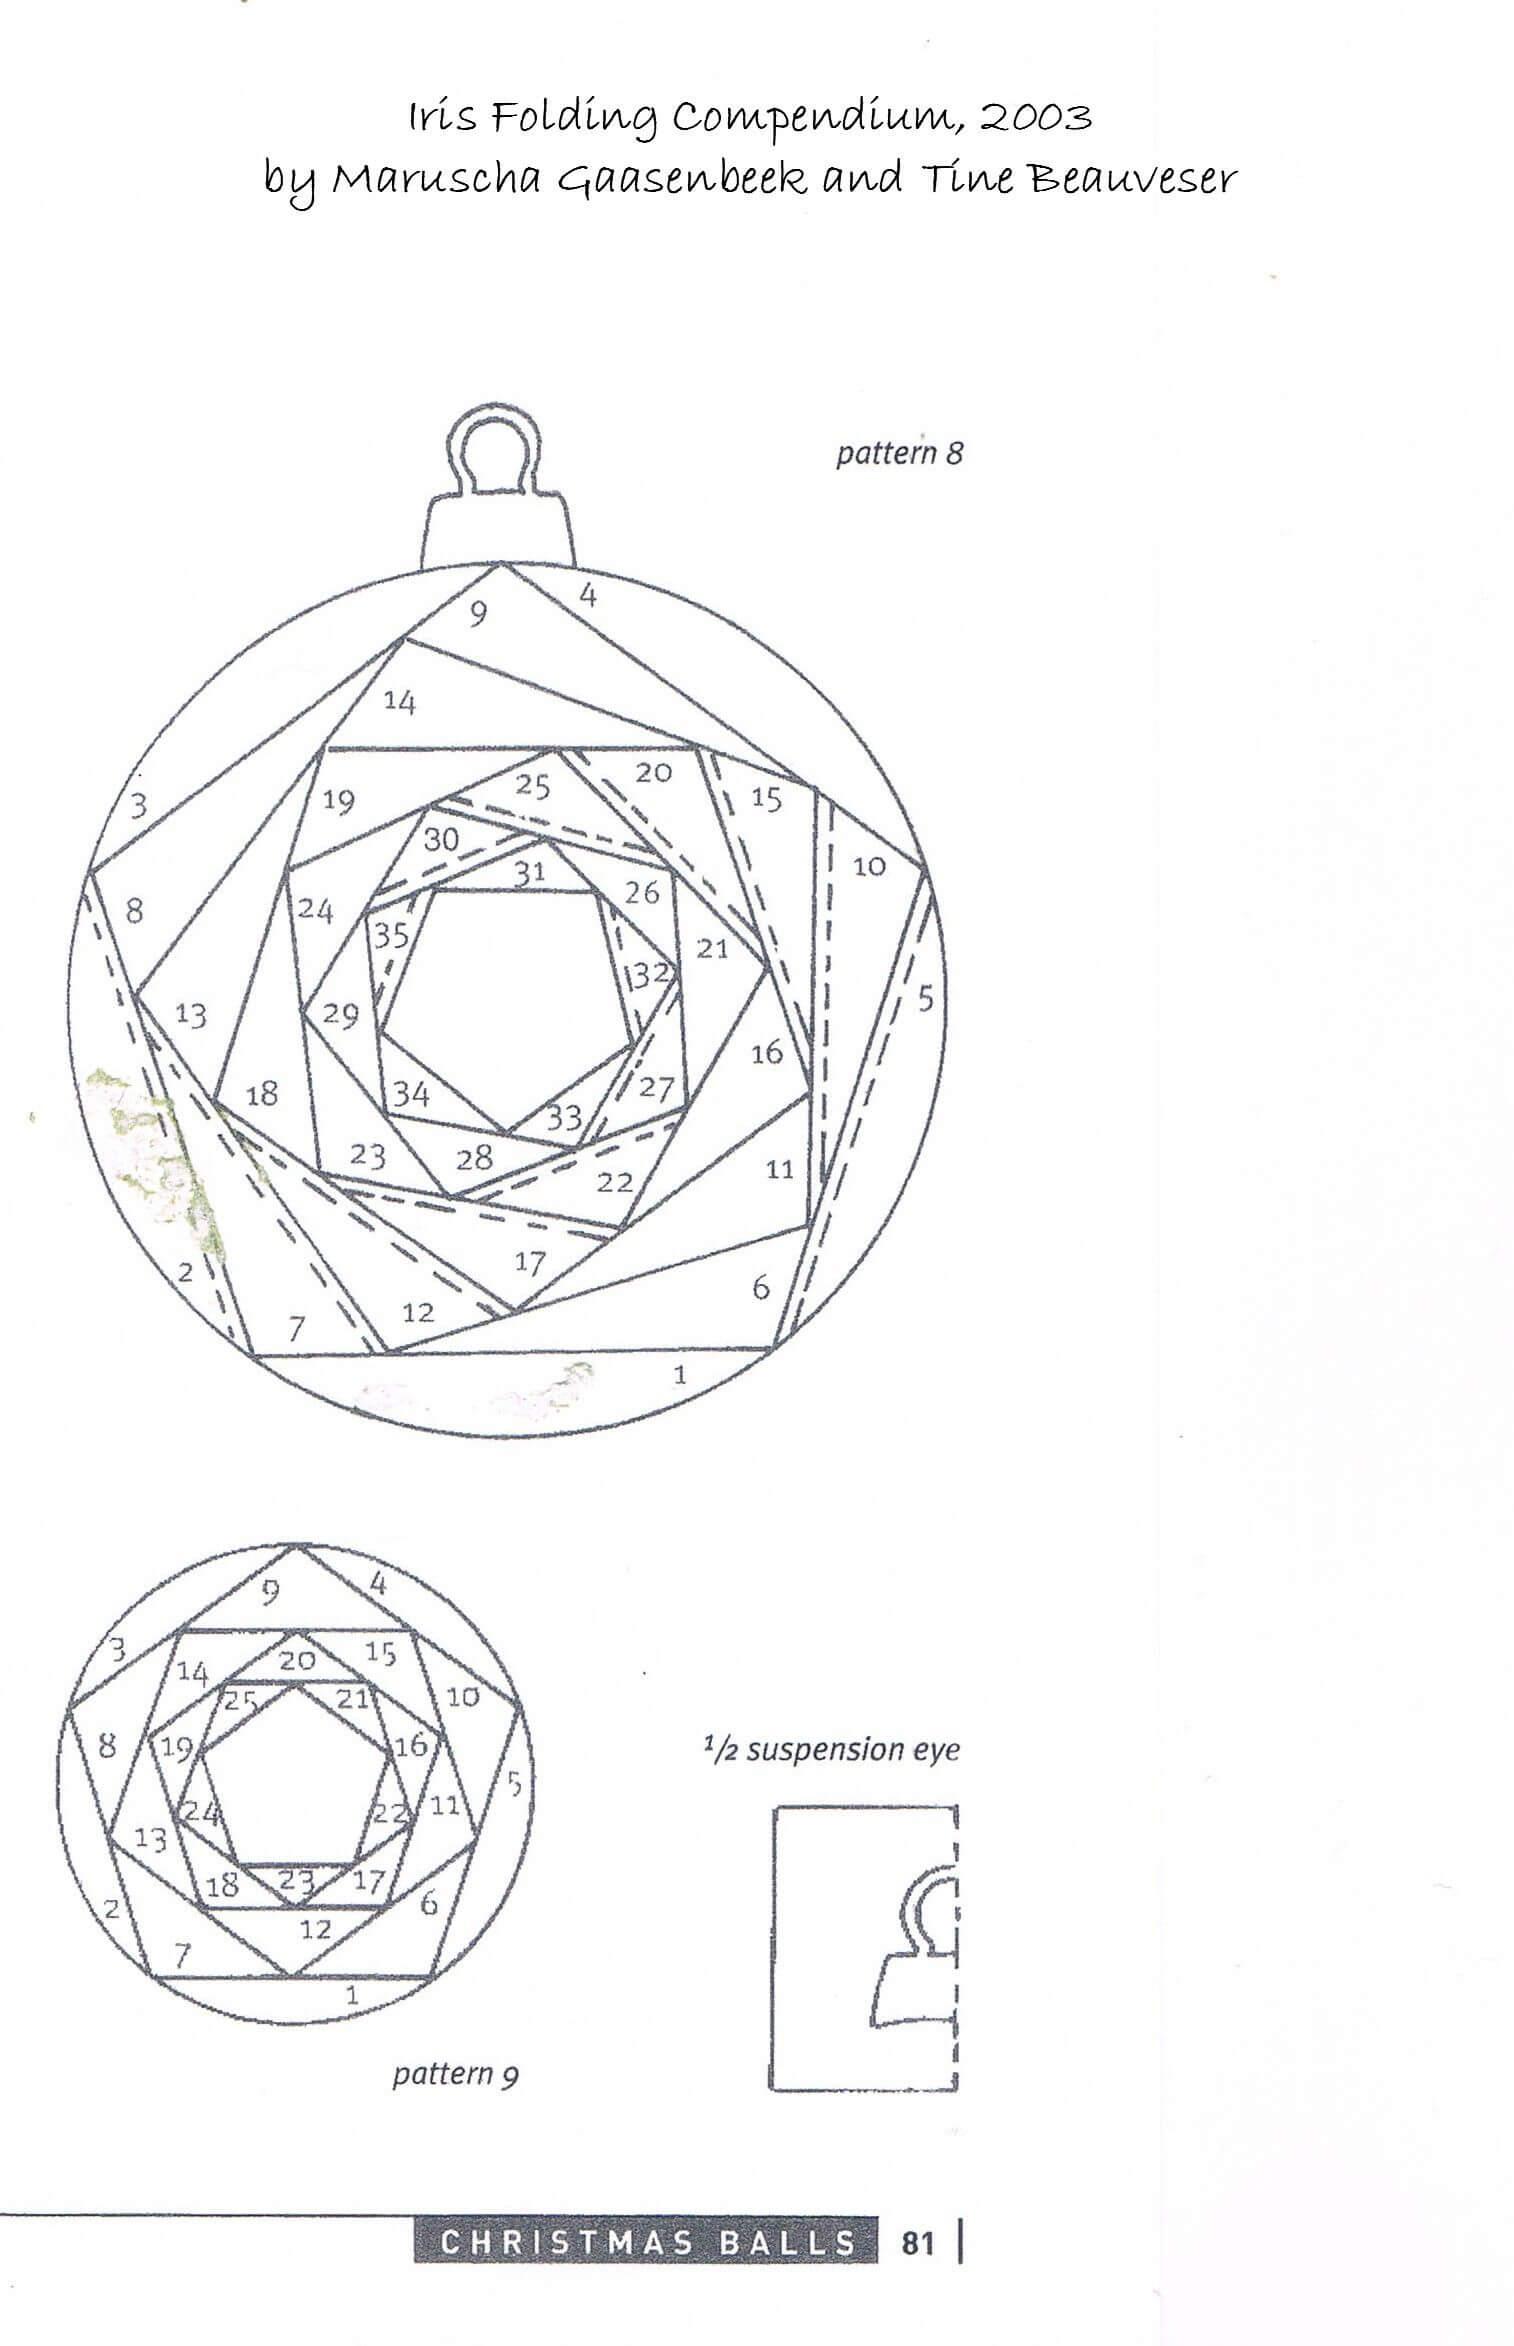 Iris Folding Patterns Free Printables |  Made Using A Within Iris Folding Christmas Cards Templates